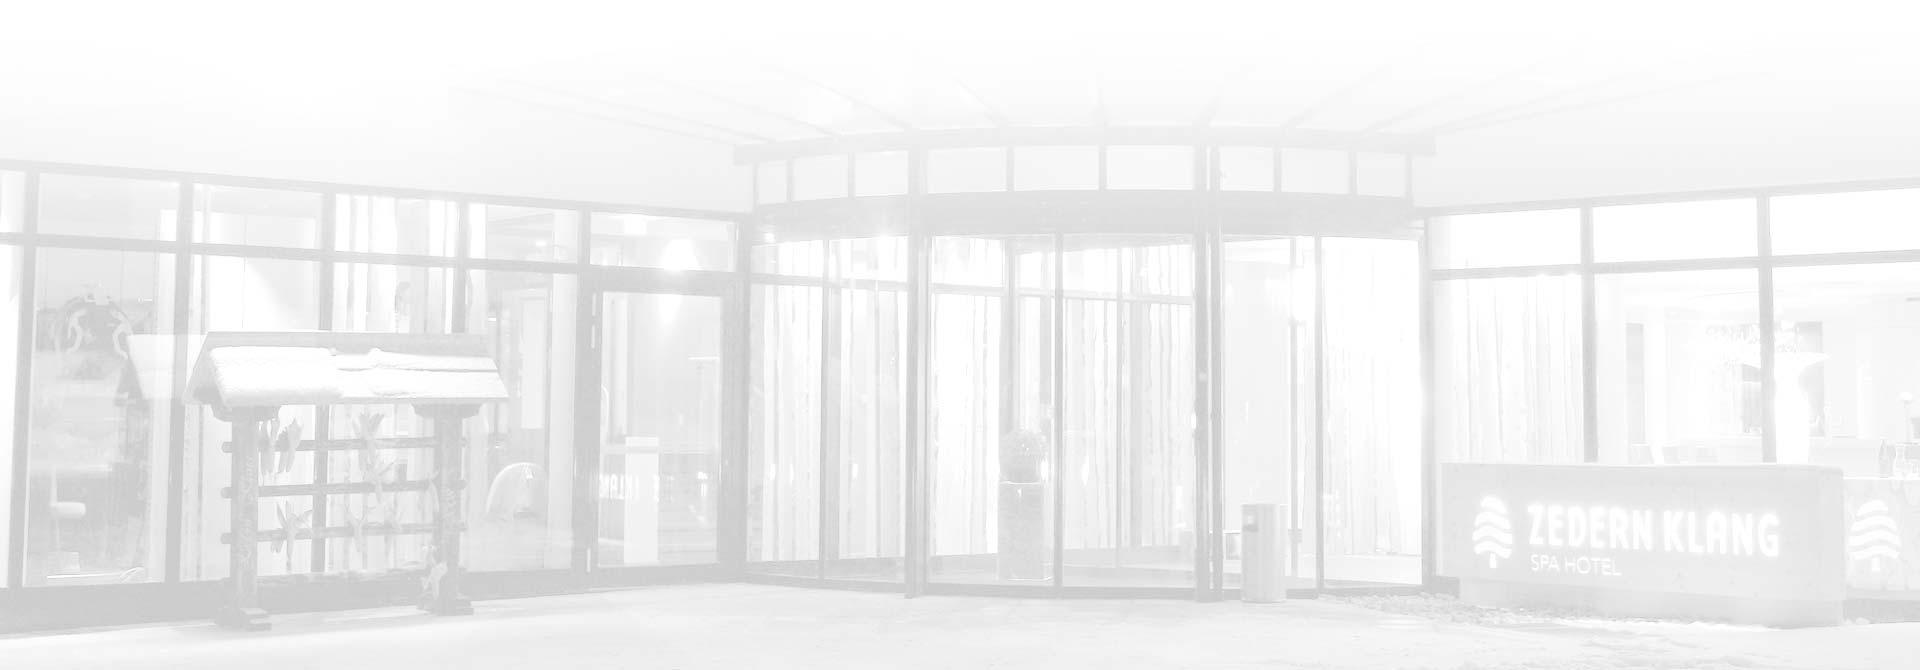 Hotel-Eingang-3-1920x670-Zede